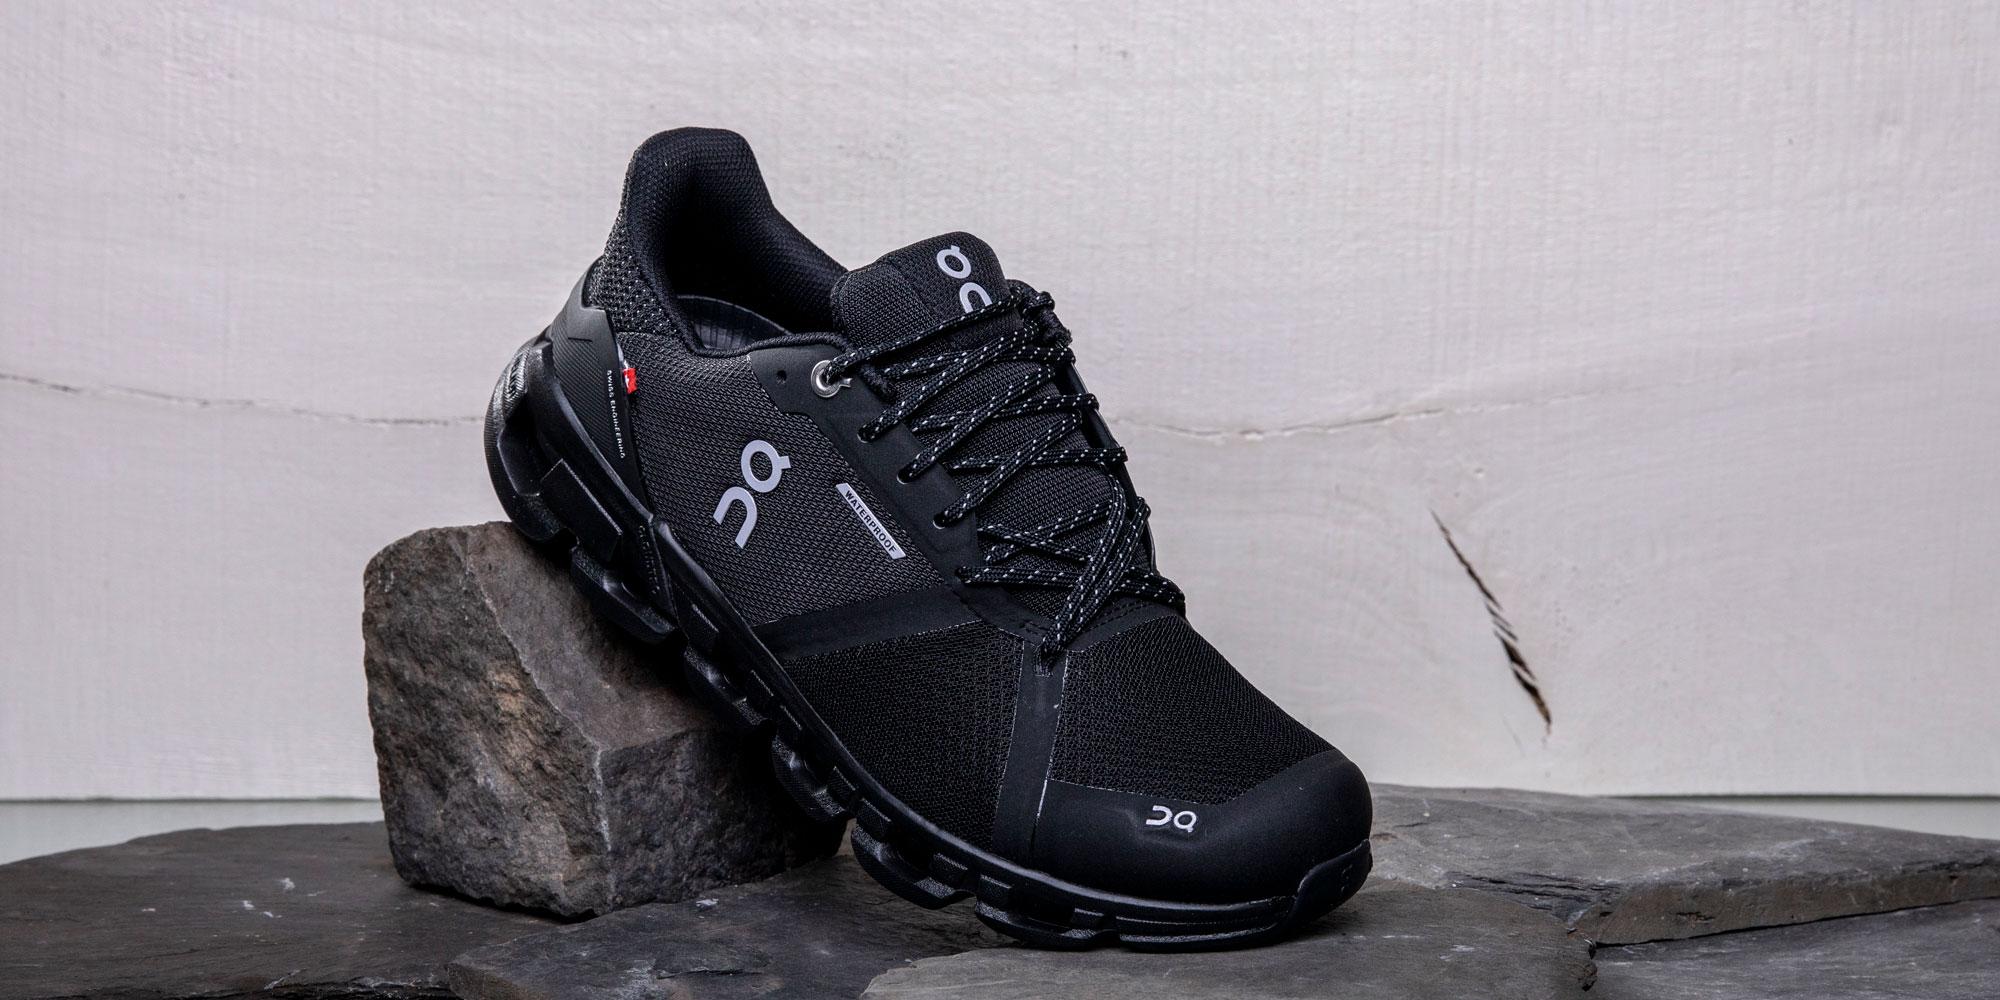 Schuh25